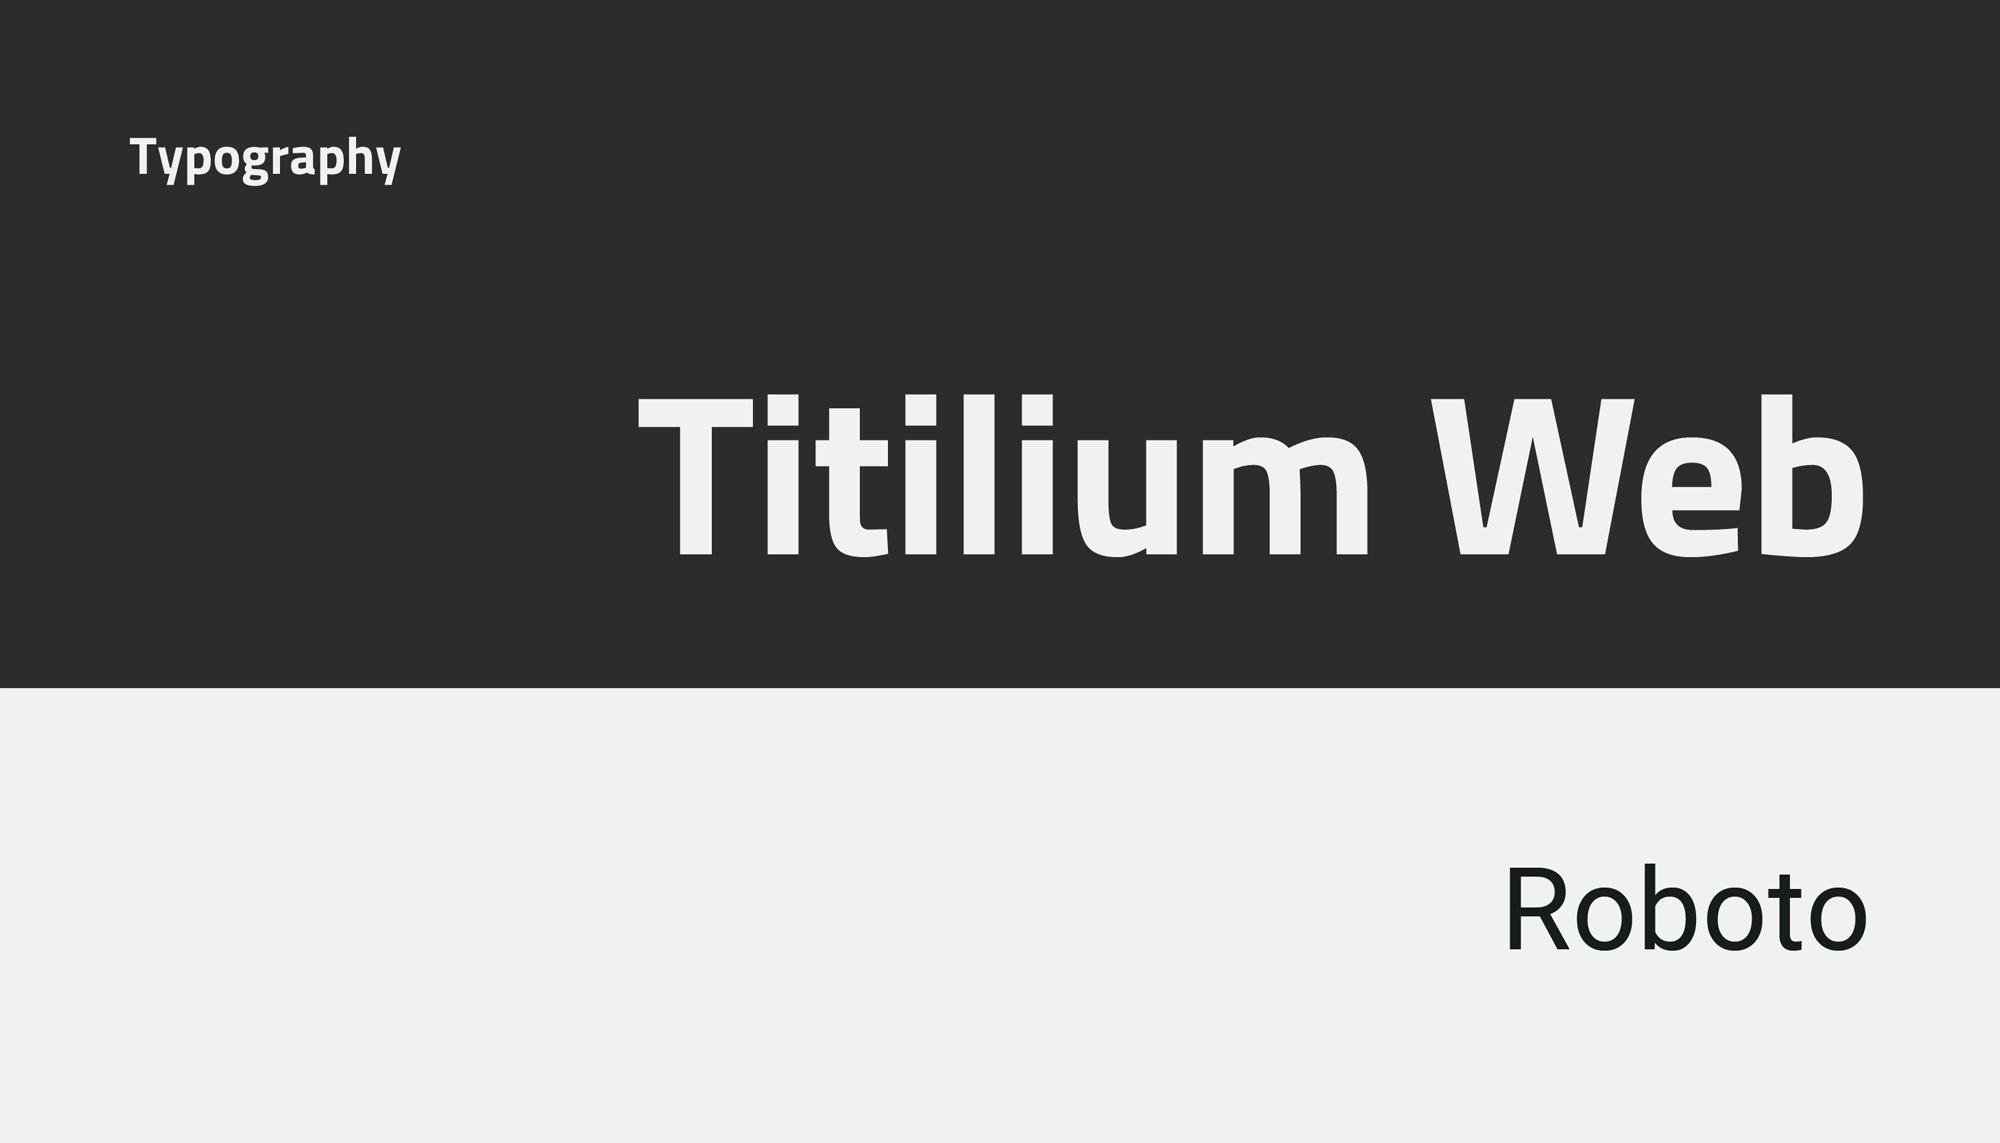 TITAN - Typography